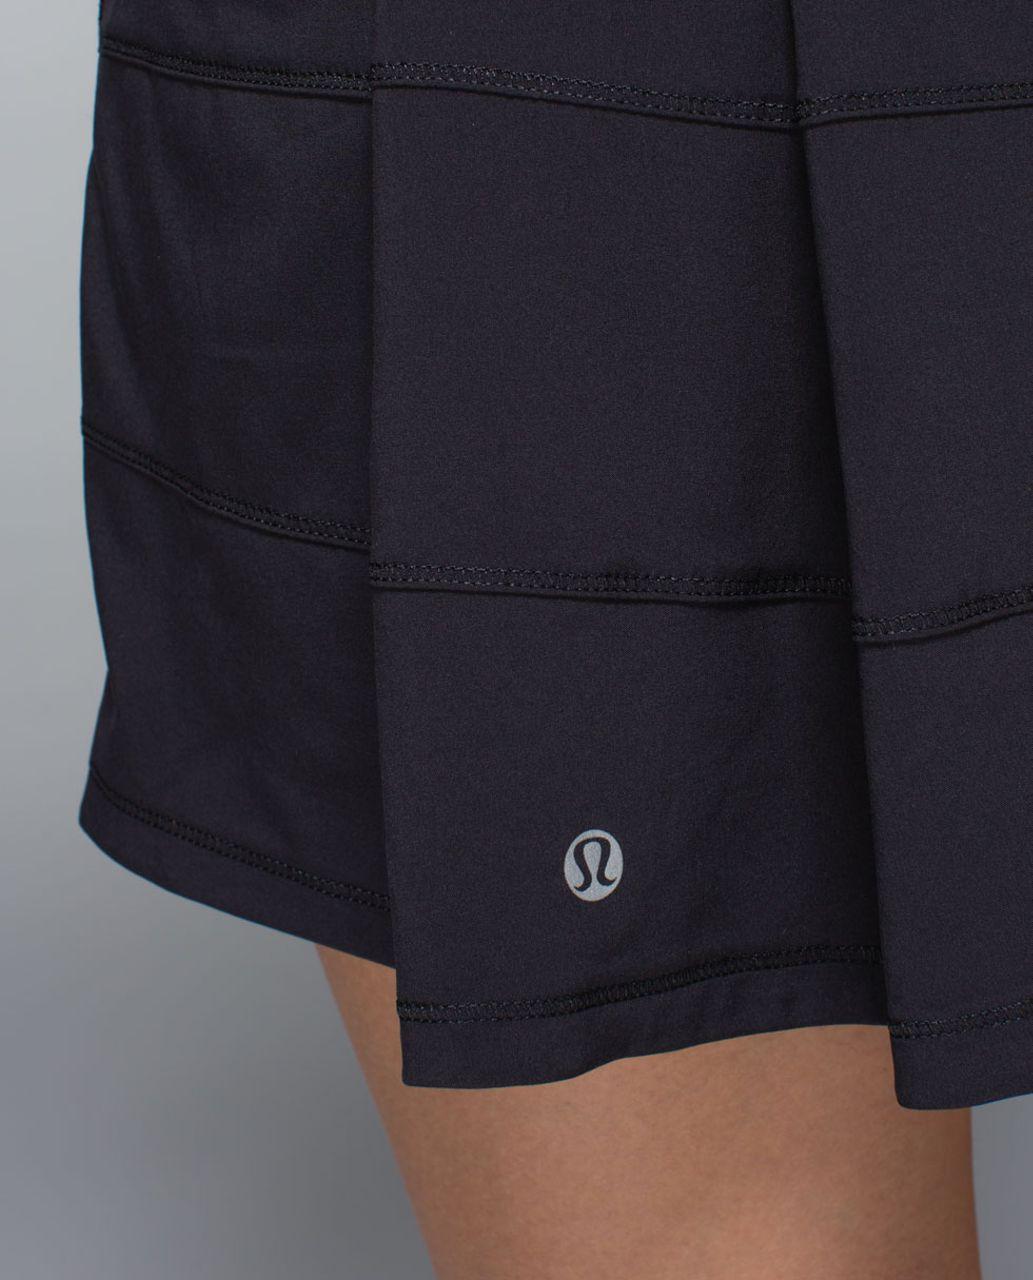 Lululemon Pace Rival Skirt (Tall) *4-way Stretch - Black